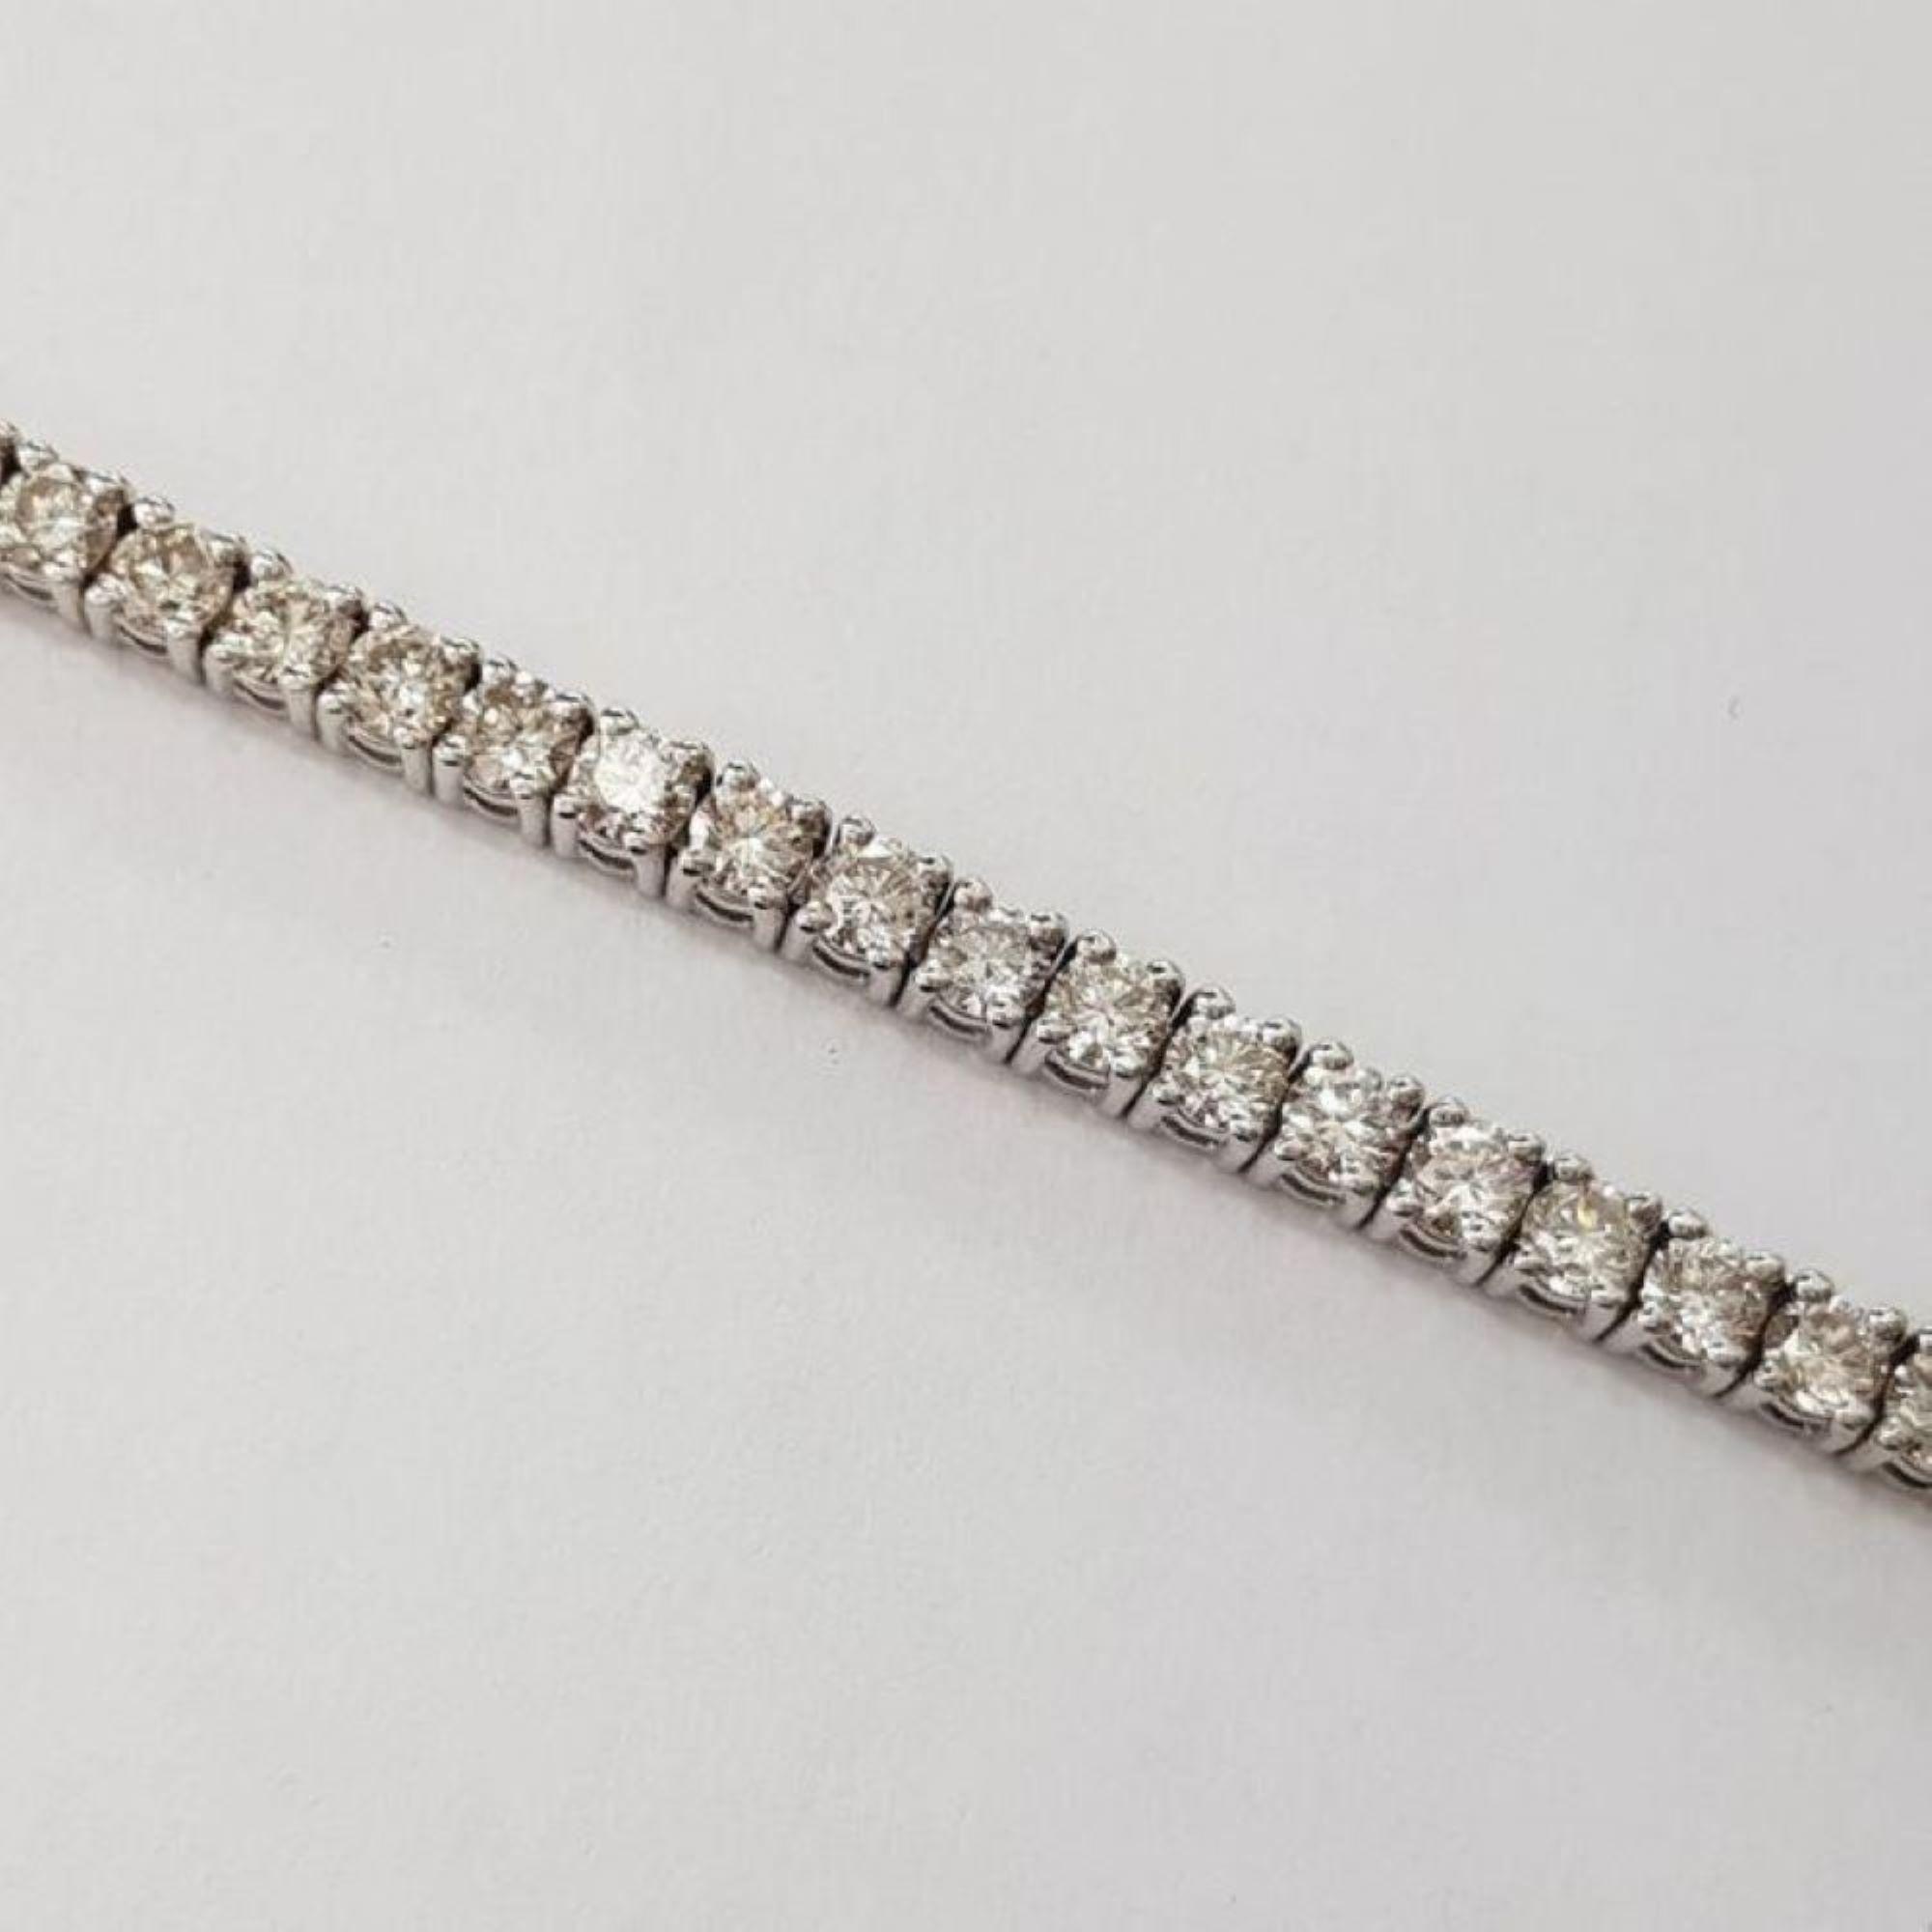 14 kt. White gold - Bracelet - 3.75 ct Diamond - Image 3 of 5